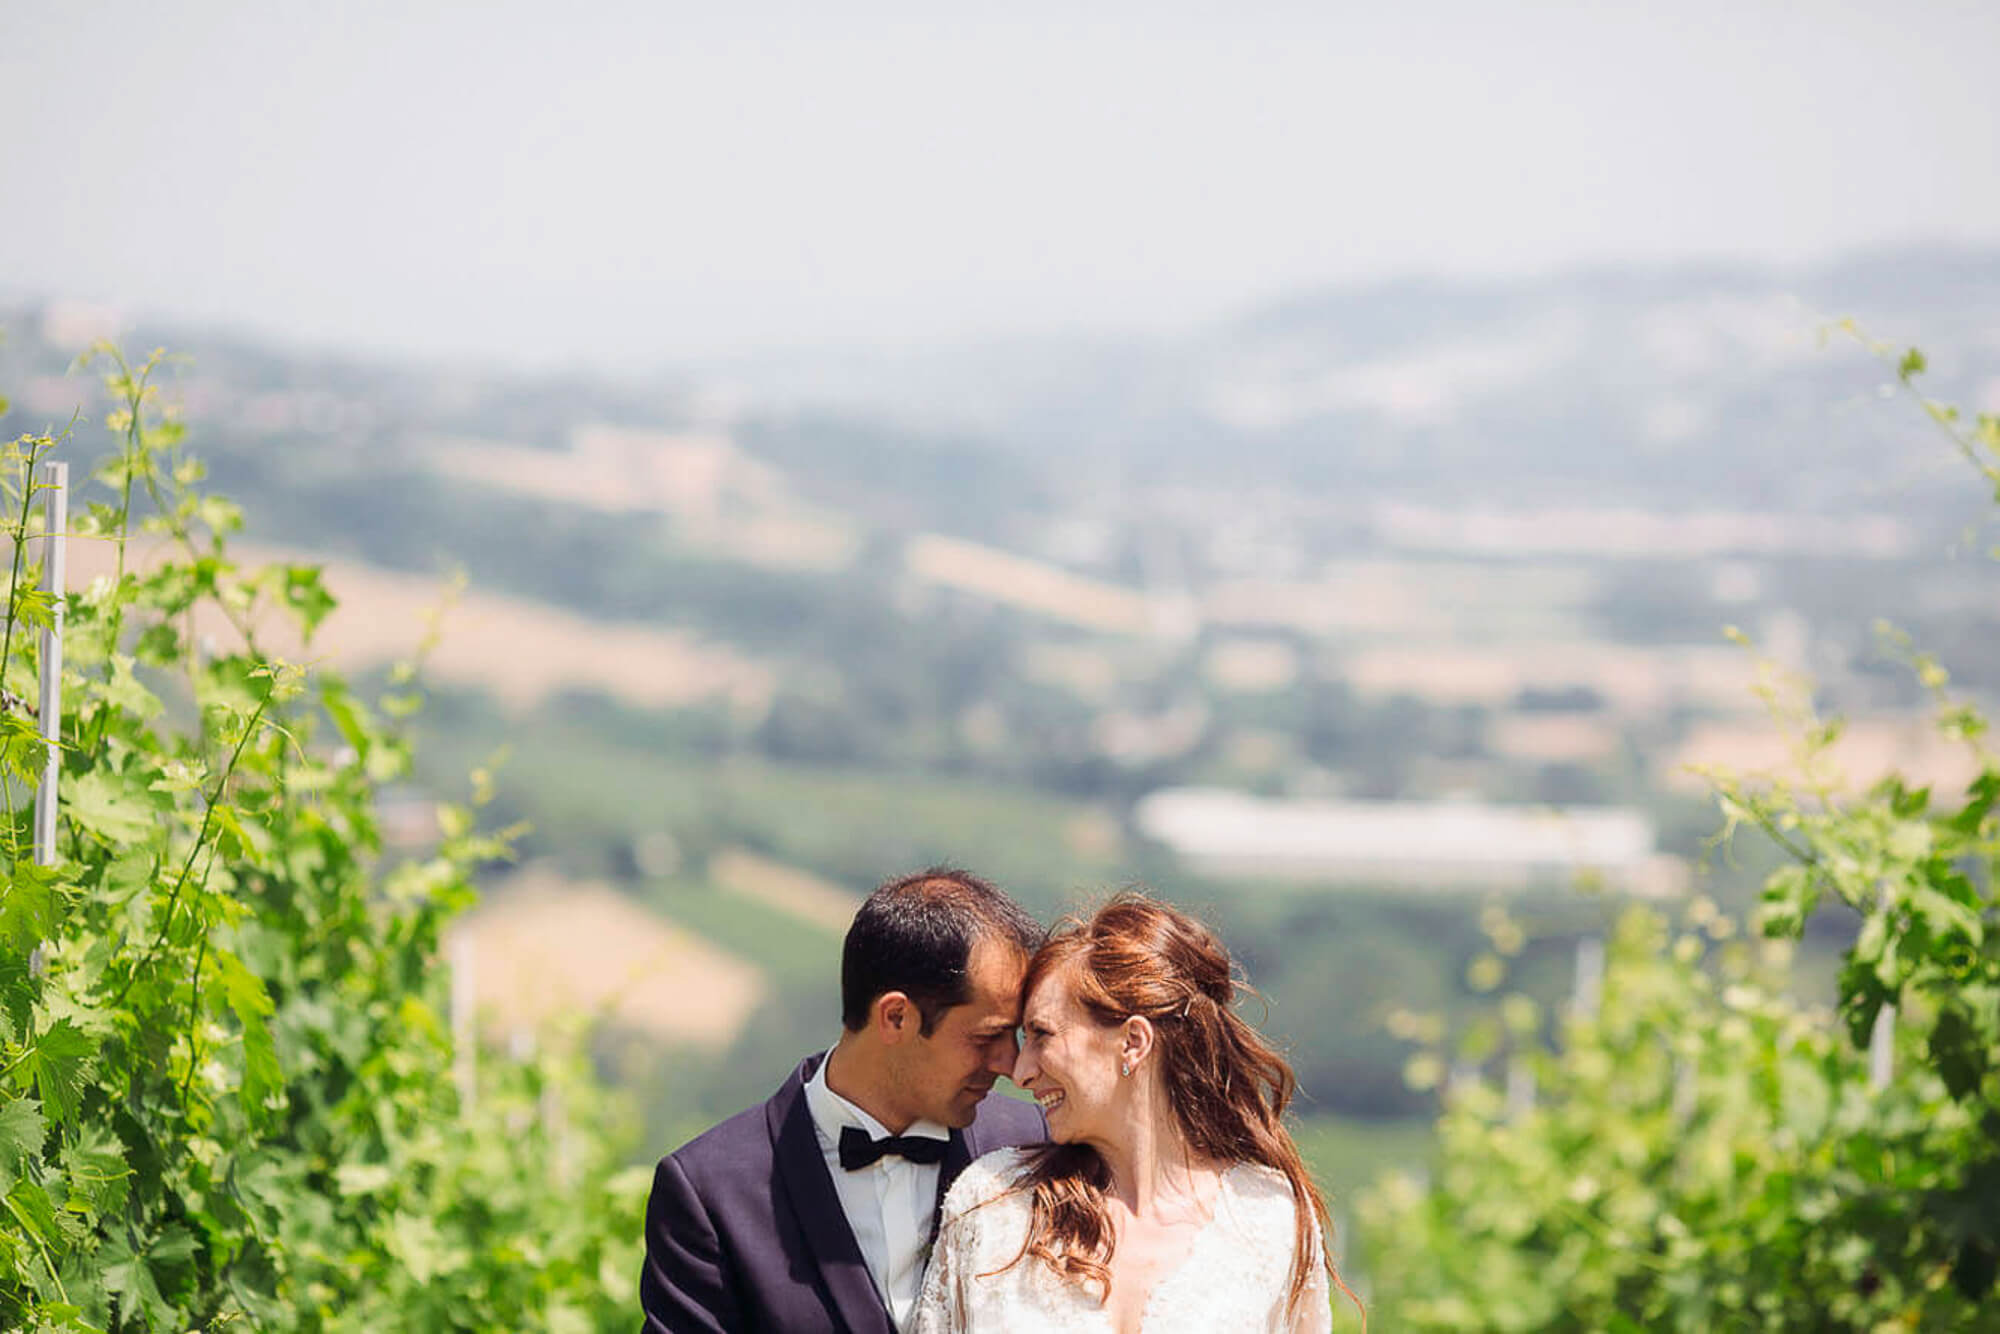 105_wedding_marche_vineyard wedding photography.jpg